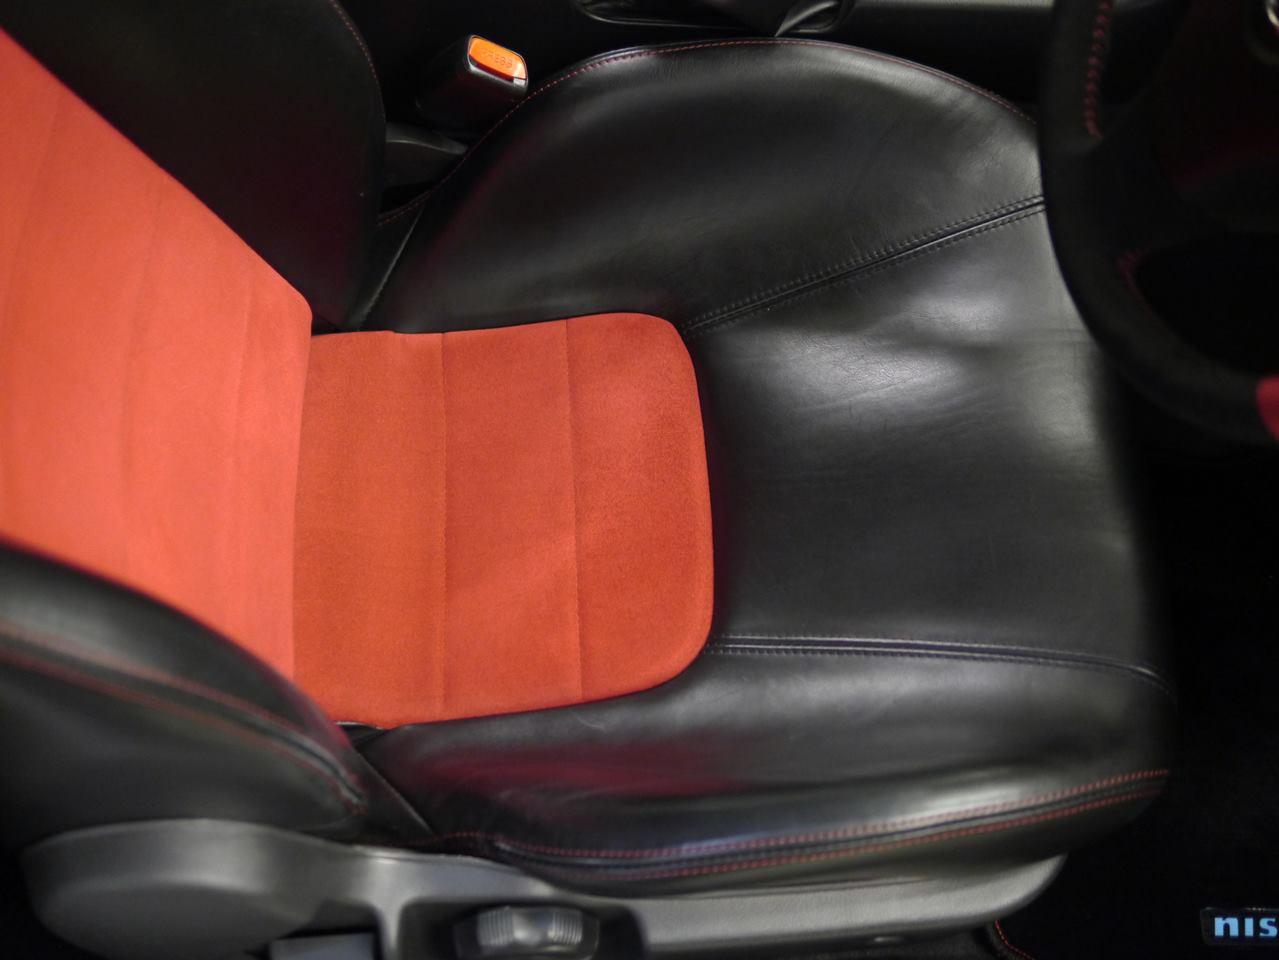 Nismo Nissan GT-R R34 Z -Tune for sale (9)